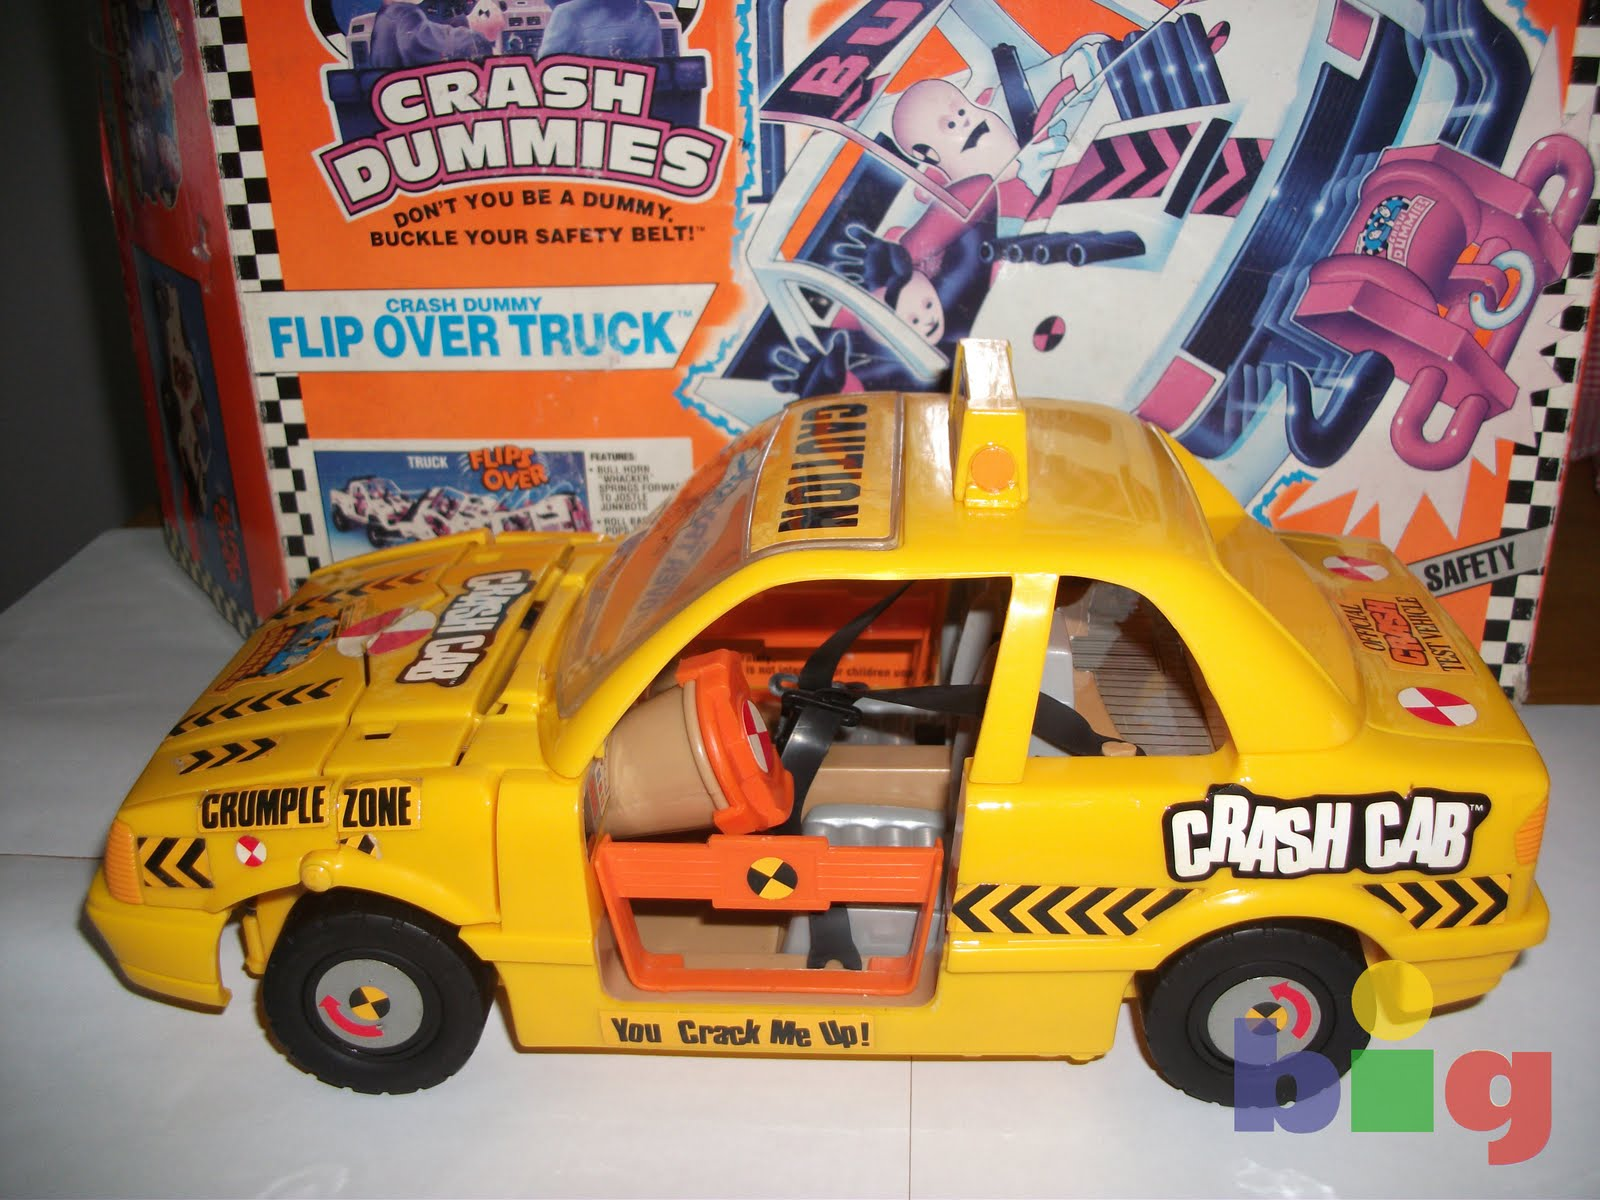 Crash Dummies